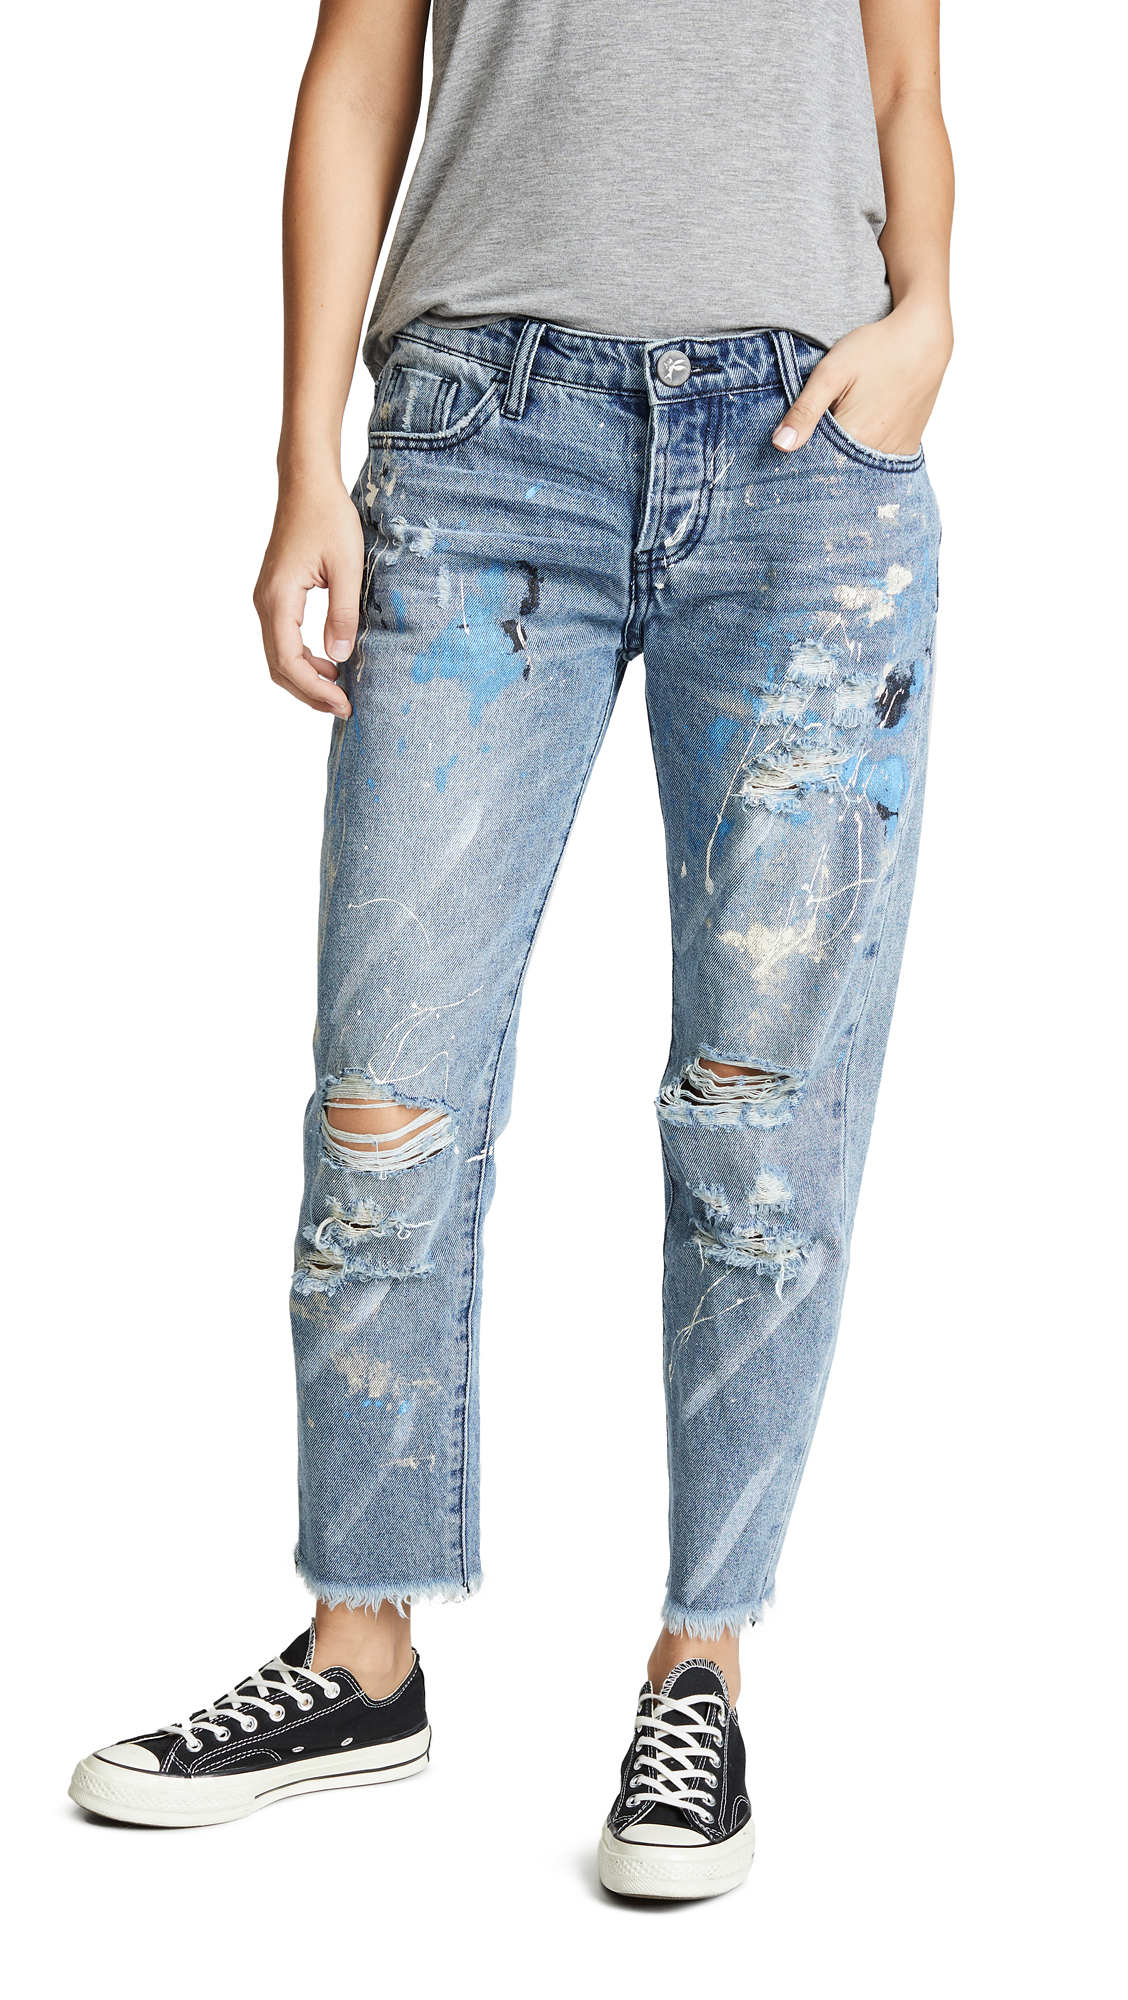 ONE TEASPOON Artiste Awesome Baggies Straight Leg Jeans in Worn Blue